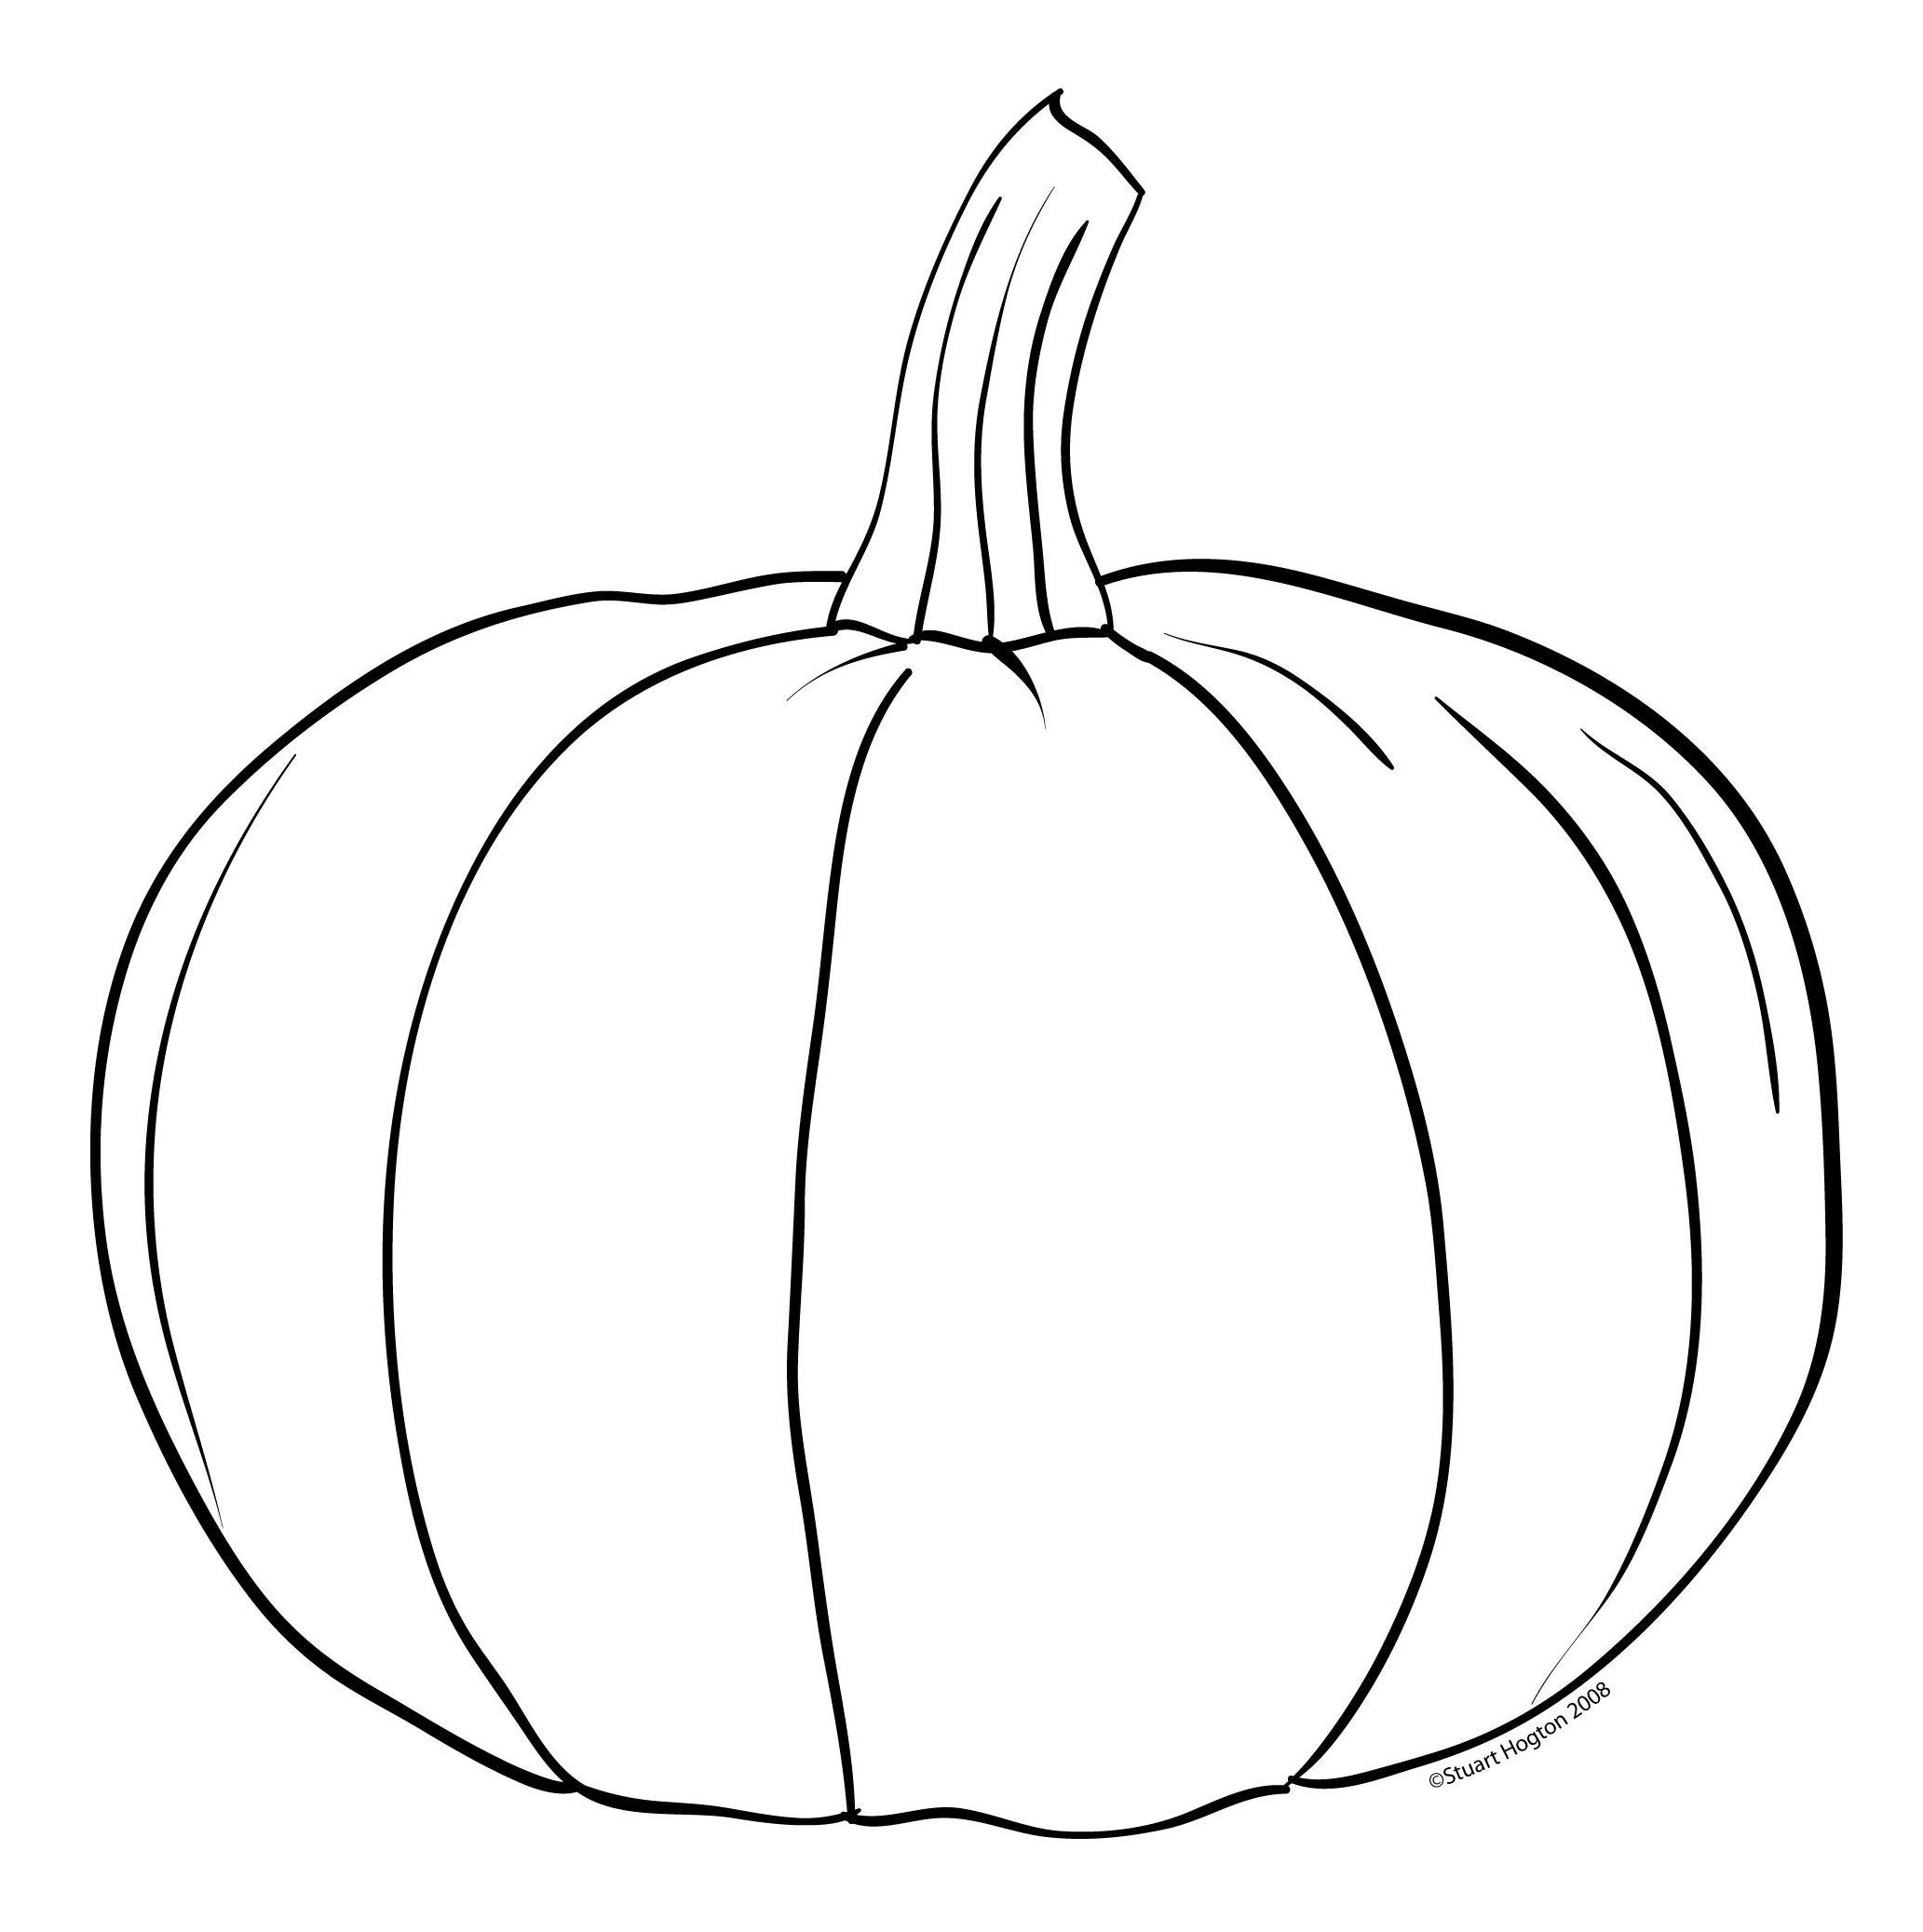 Pumpkin Coloring Template Pumpkin Template Pumpkin Template Printable